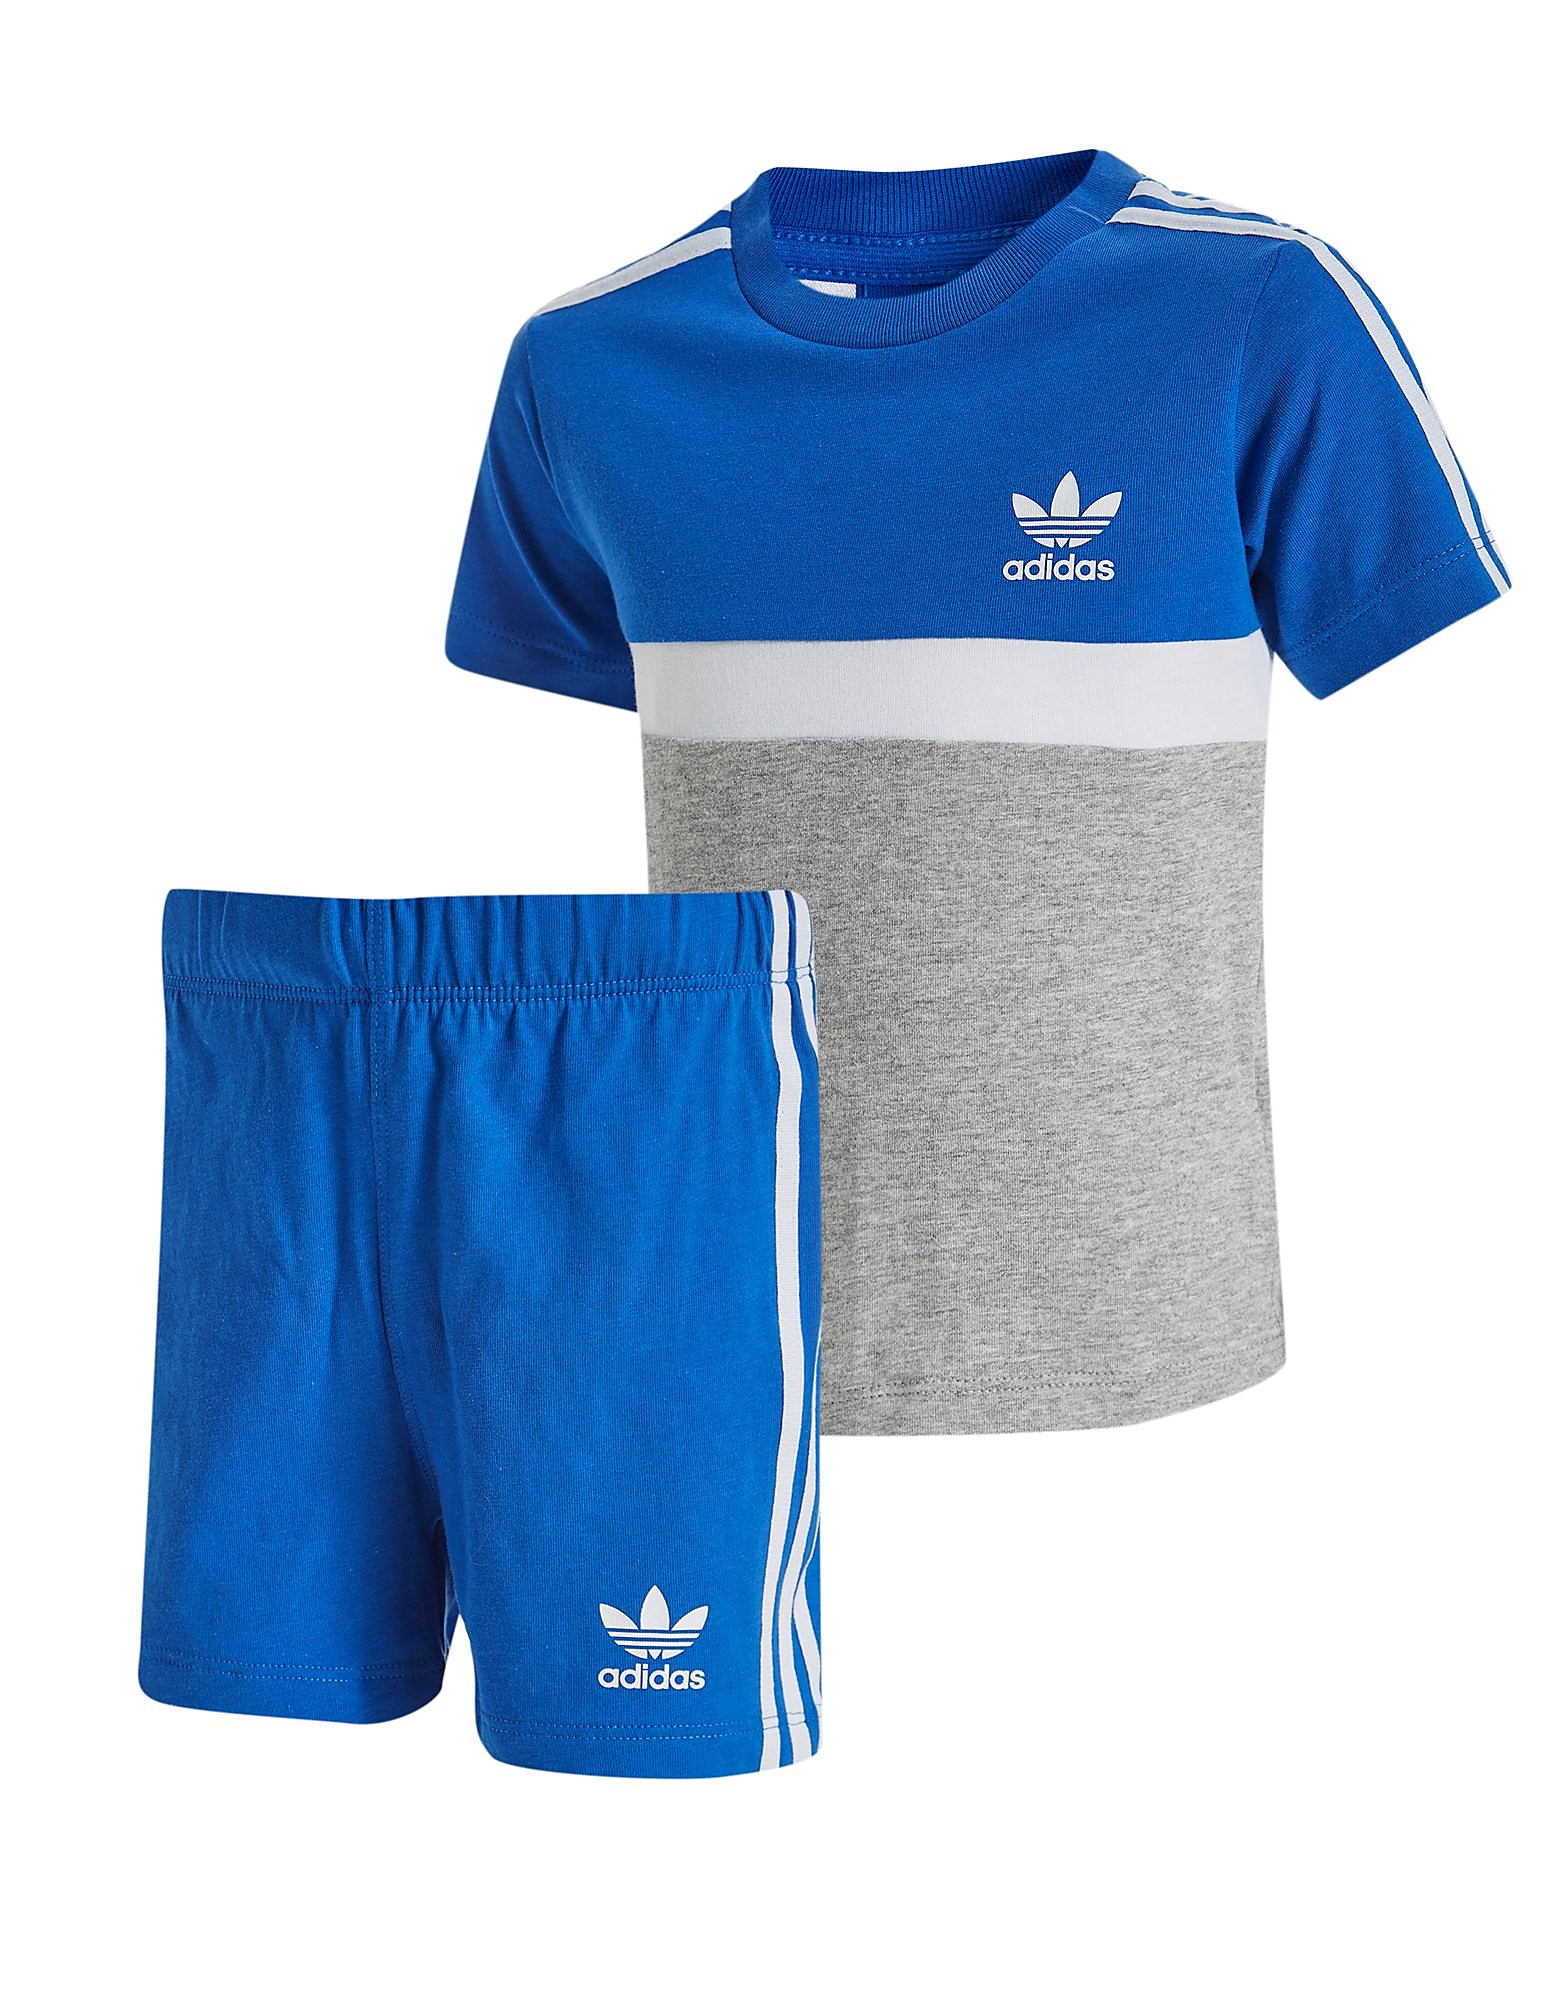 adidas Originals Itasca T-Shirt/Short Set Infant